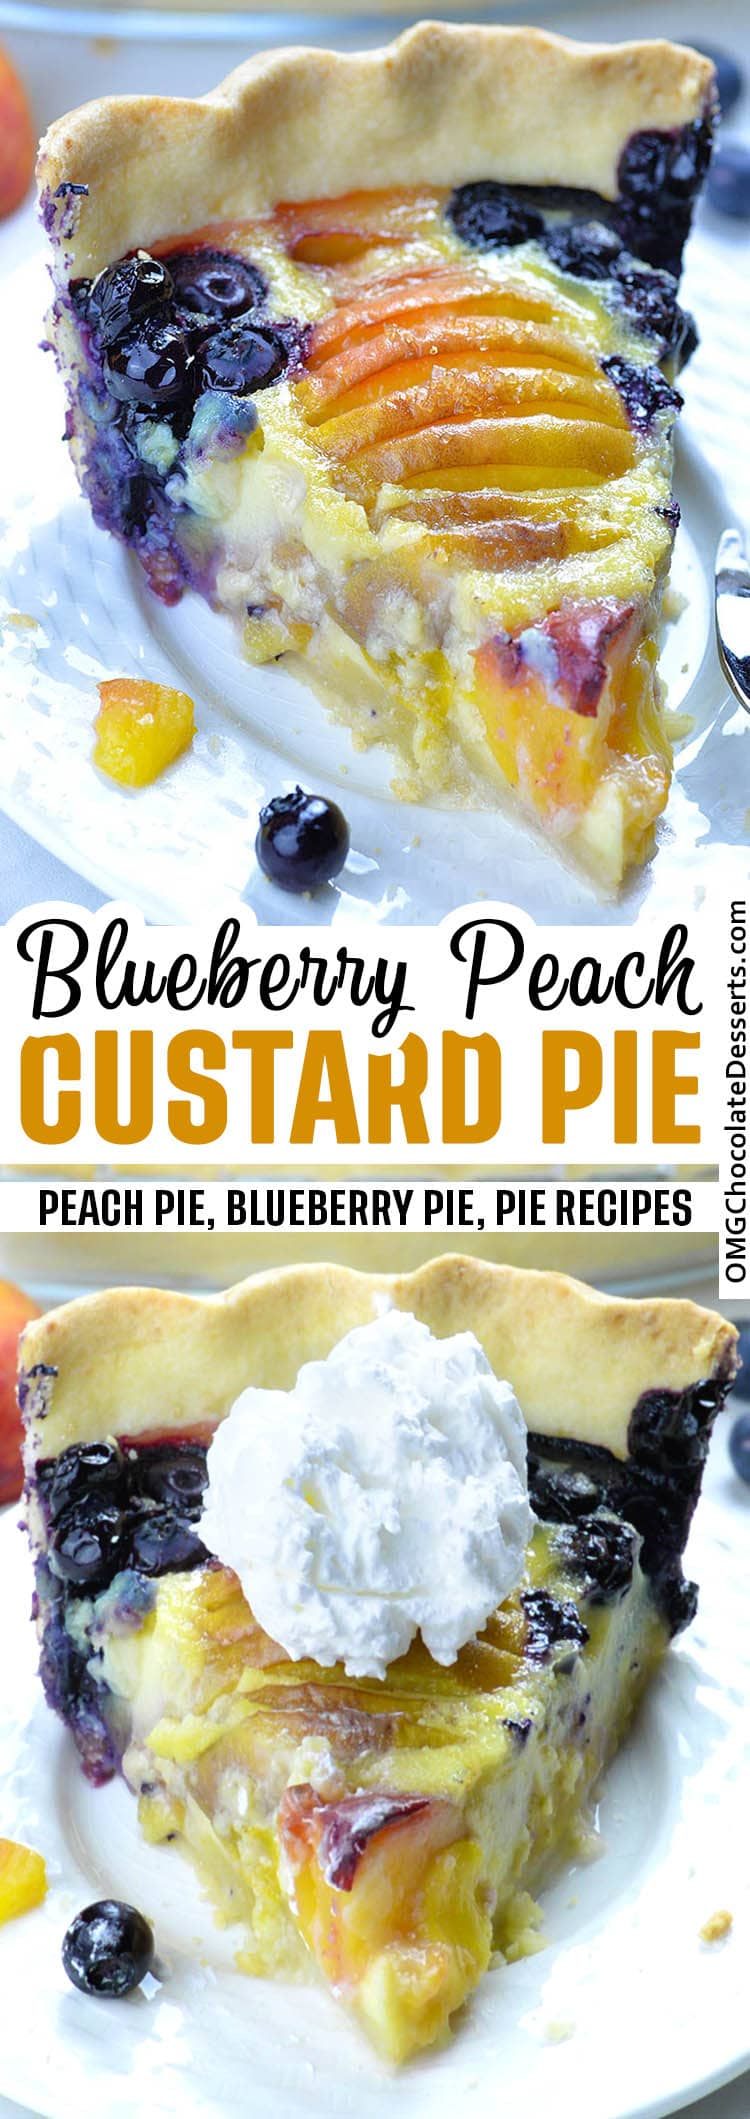 Blueberry Peach Custard Pie